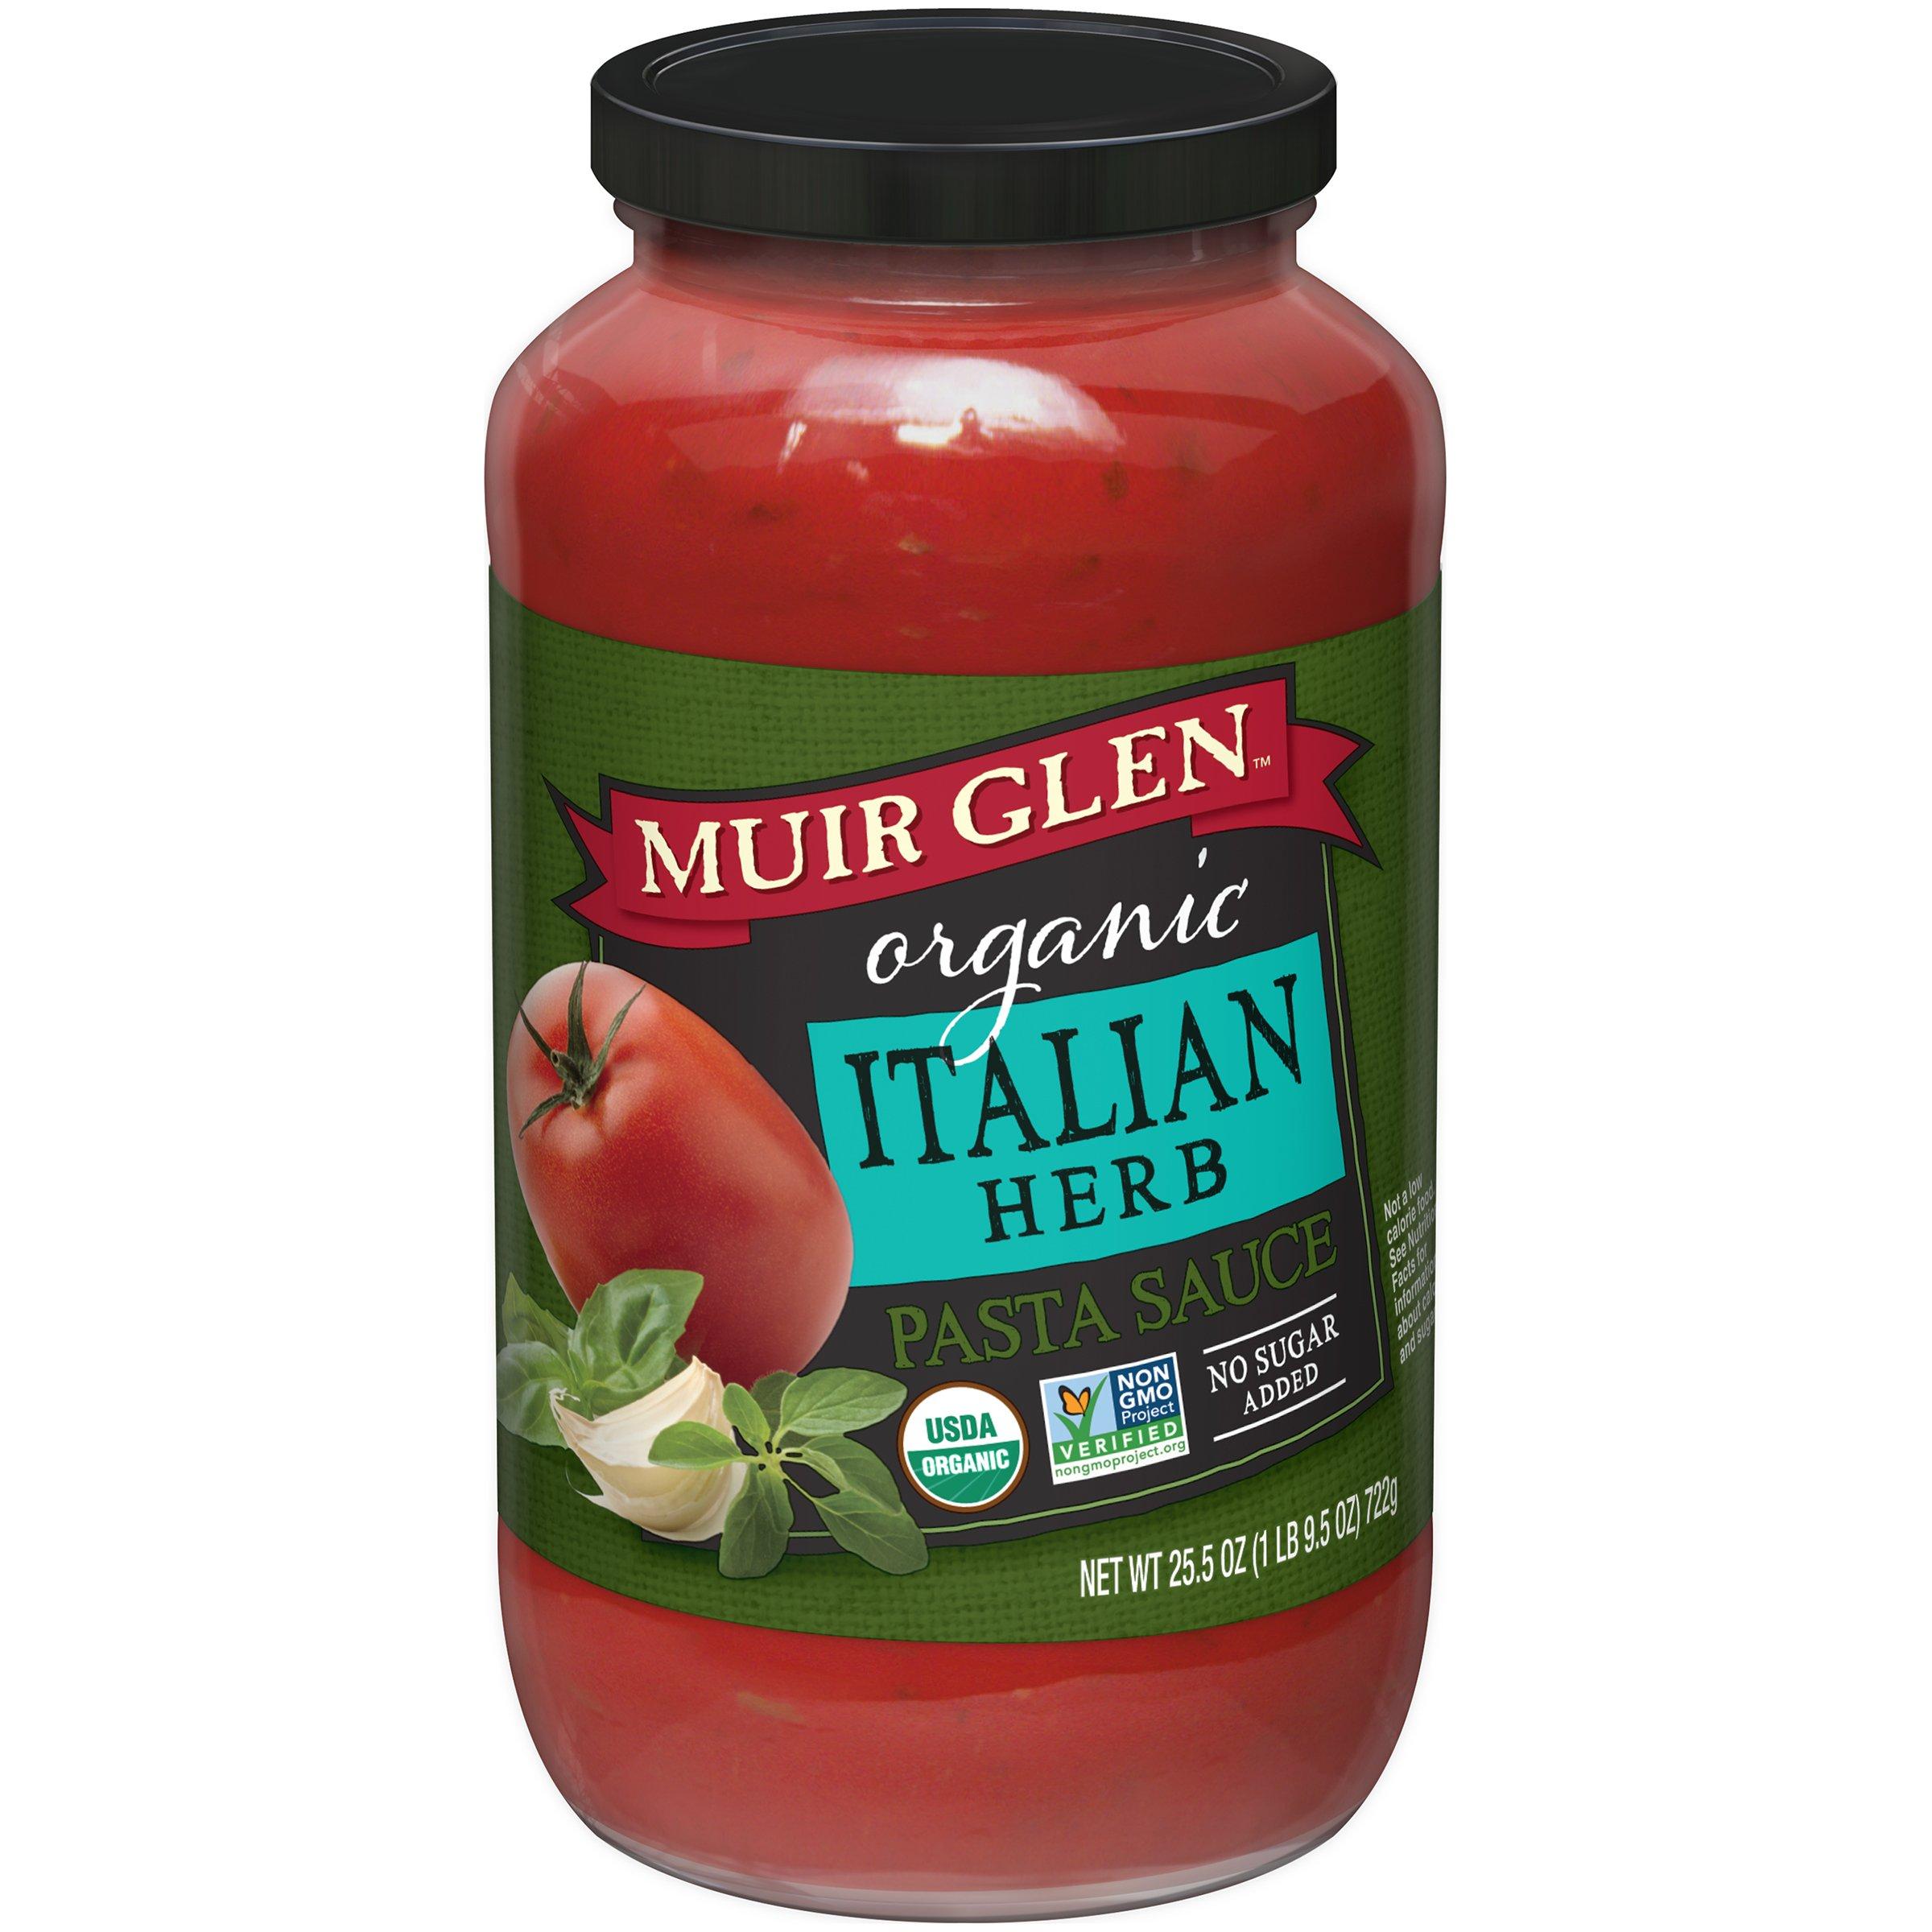 Muir Glen Organic Pasta Sauce, Italian Herb, No Sugar Added, 25.5 Ounce Glass Jar (Pack of 12)